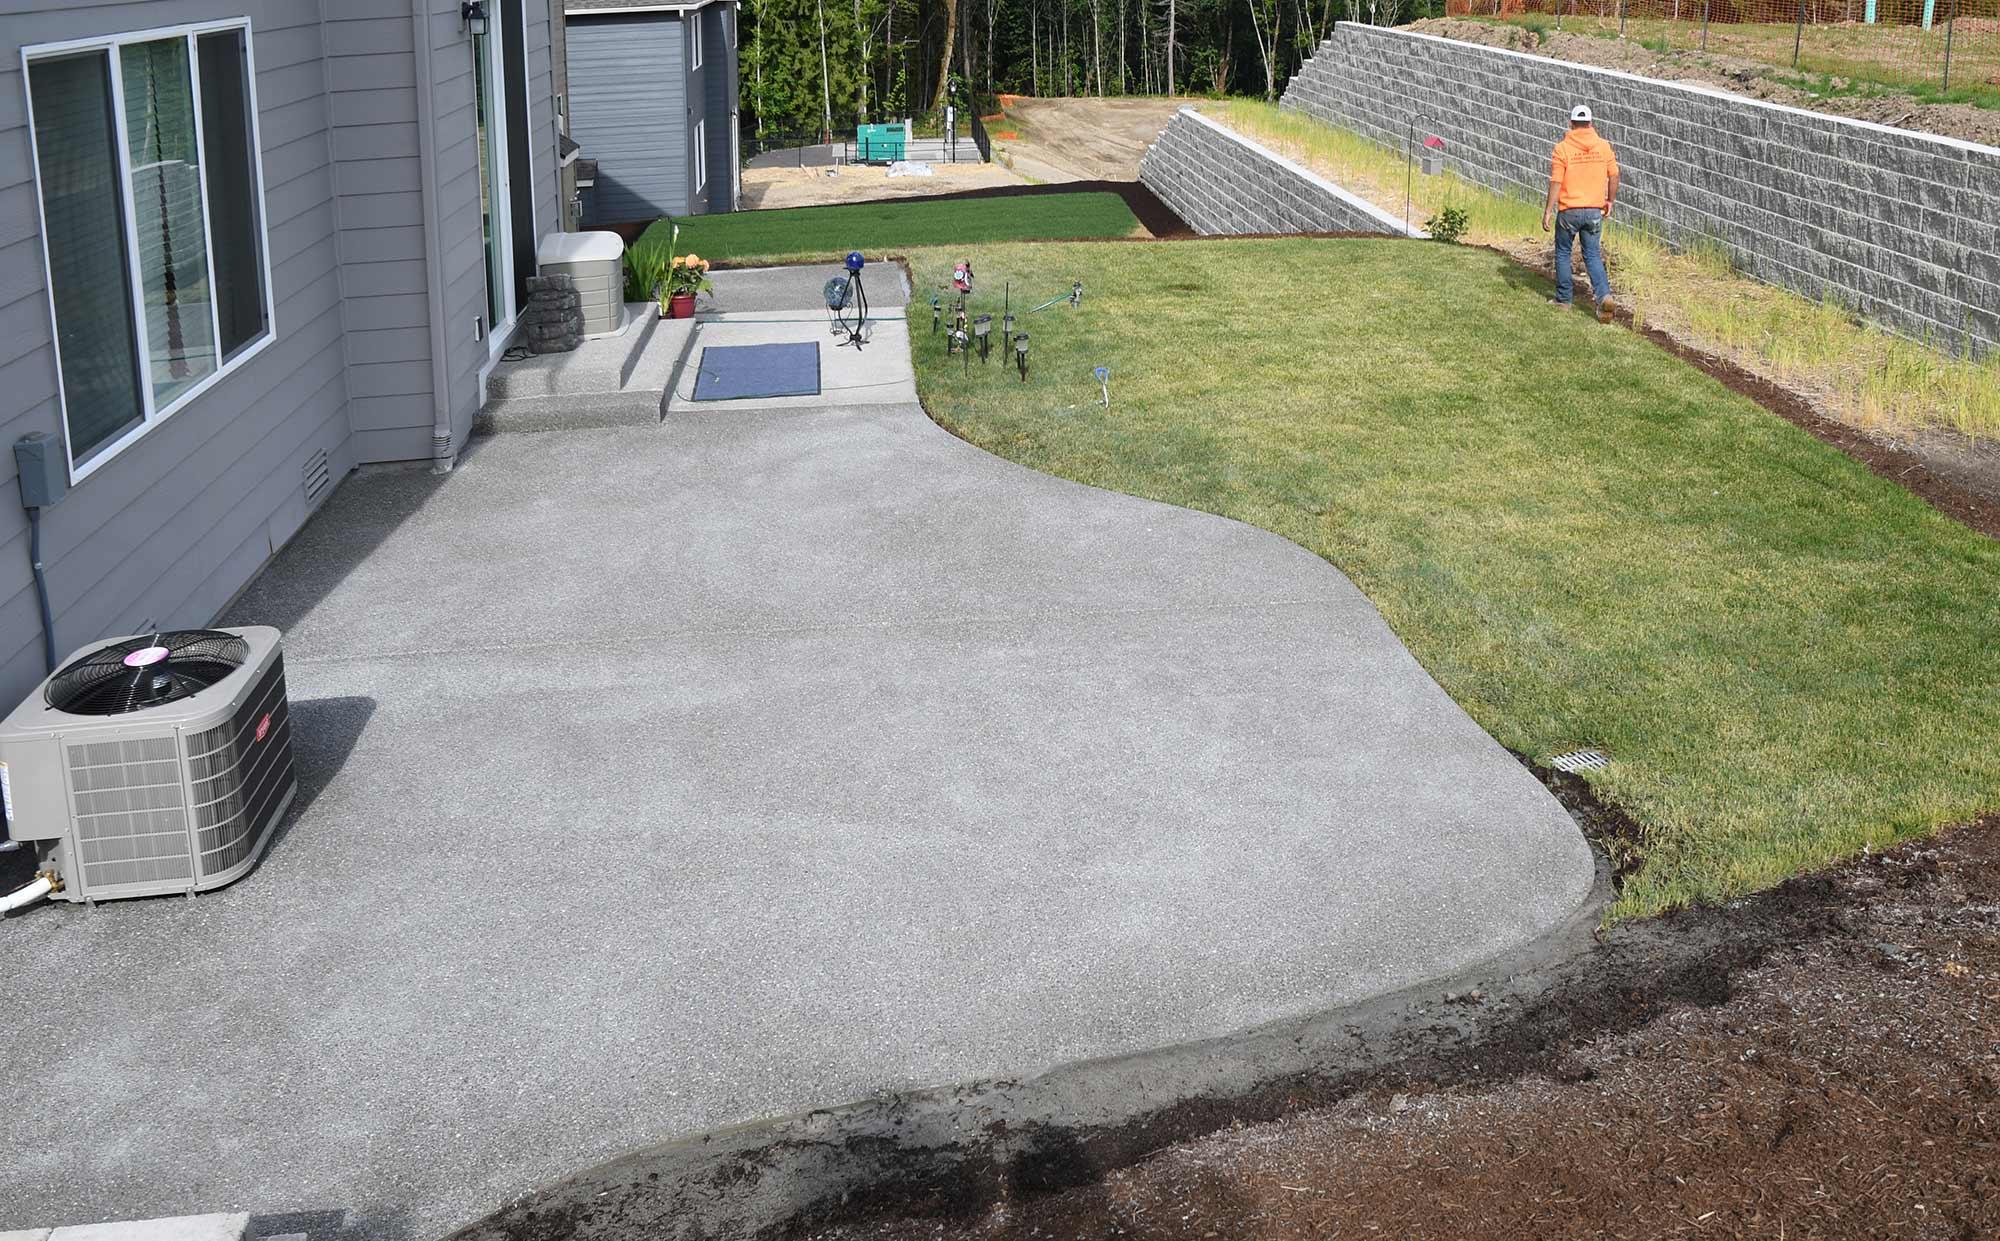 Hawks Prairie Concrete Patio Extension - AJB Landscaping ... on Backyard Patio Extension id=51475